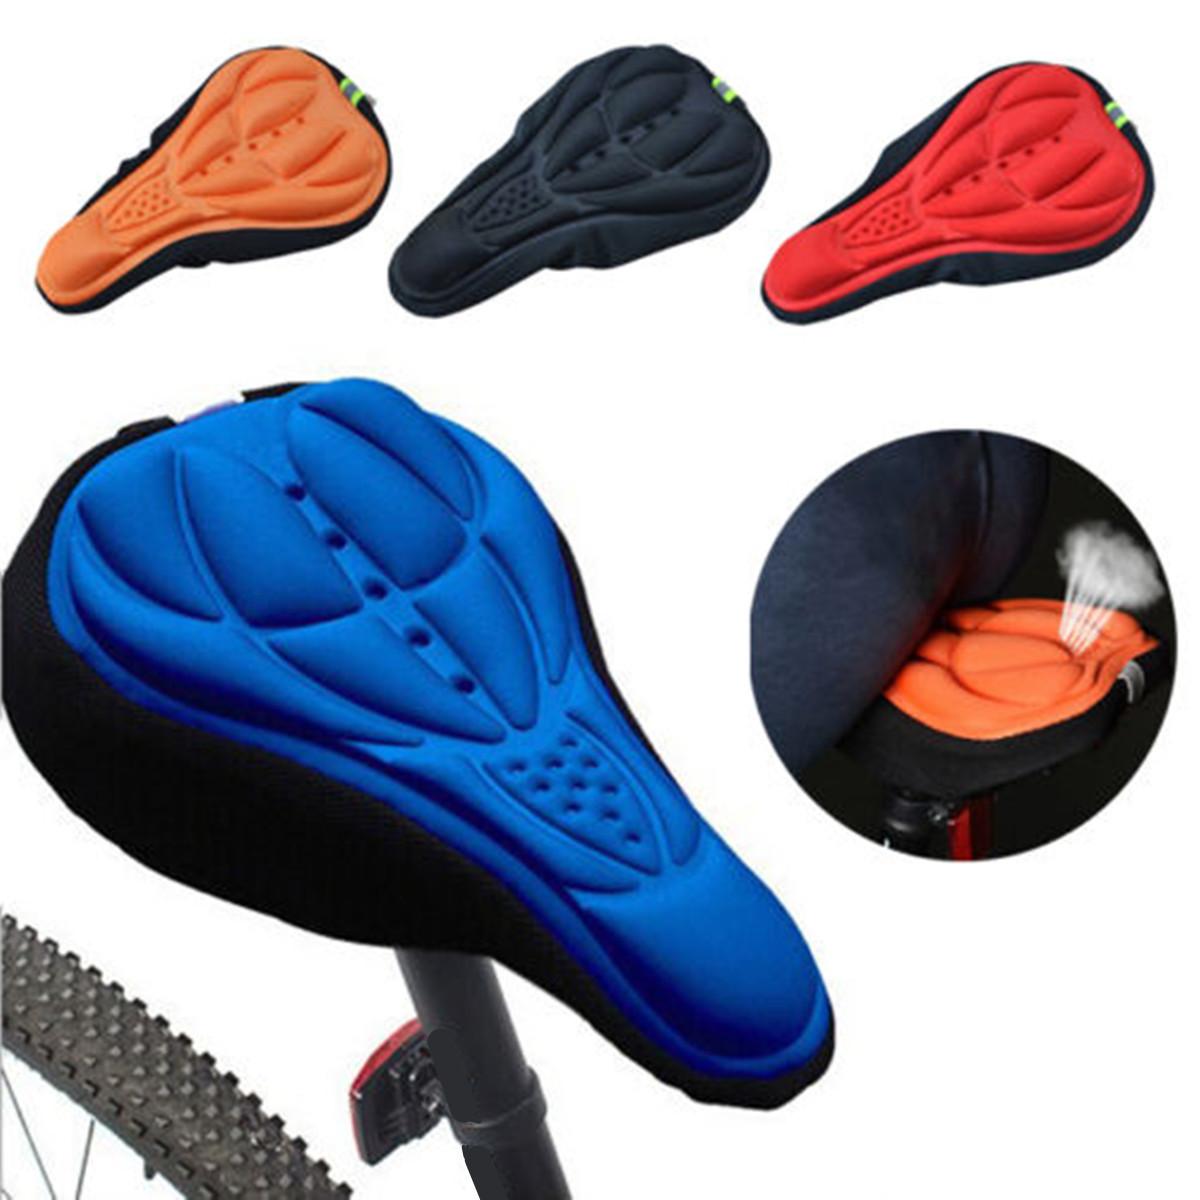 Cycling Bike 3D Silicone Gel Pad Seat Saddle Cover Soft Cushion Black